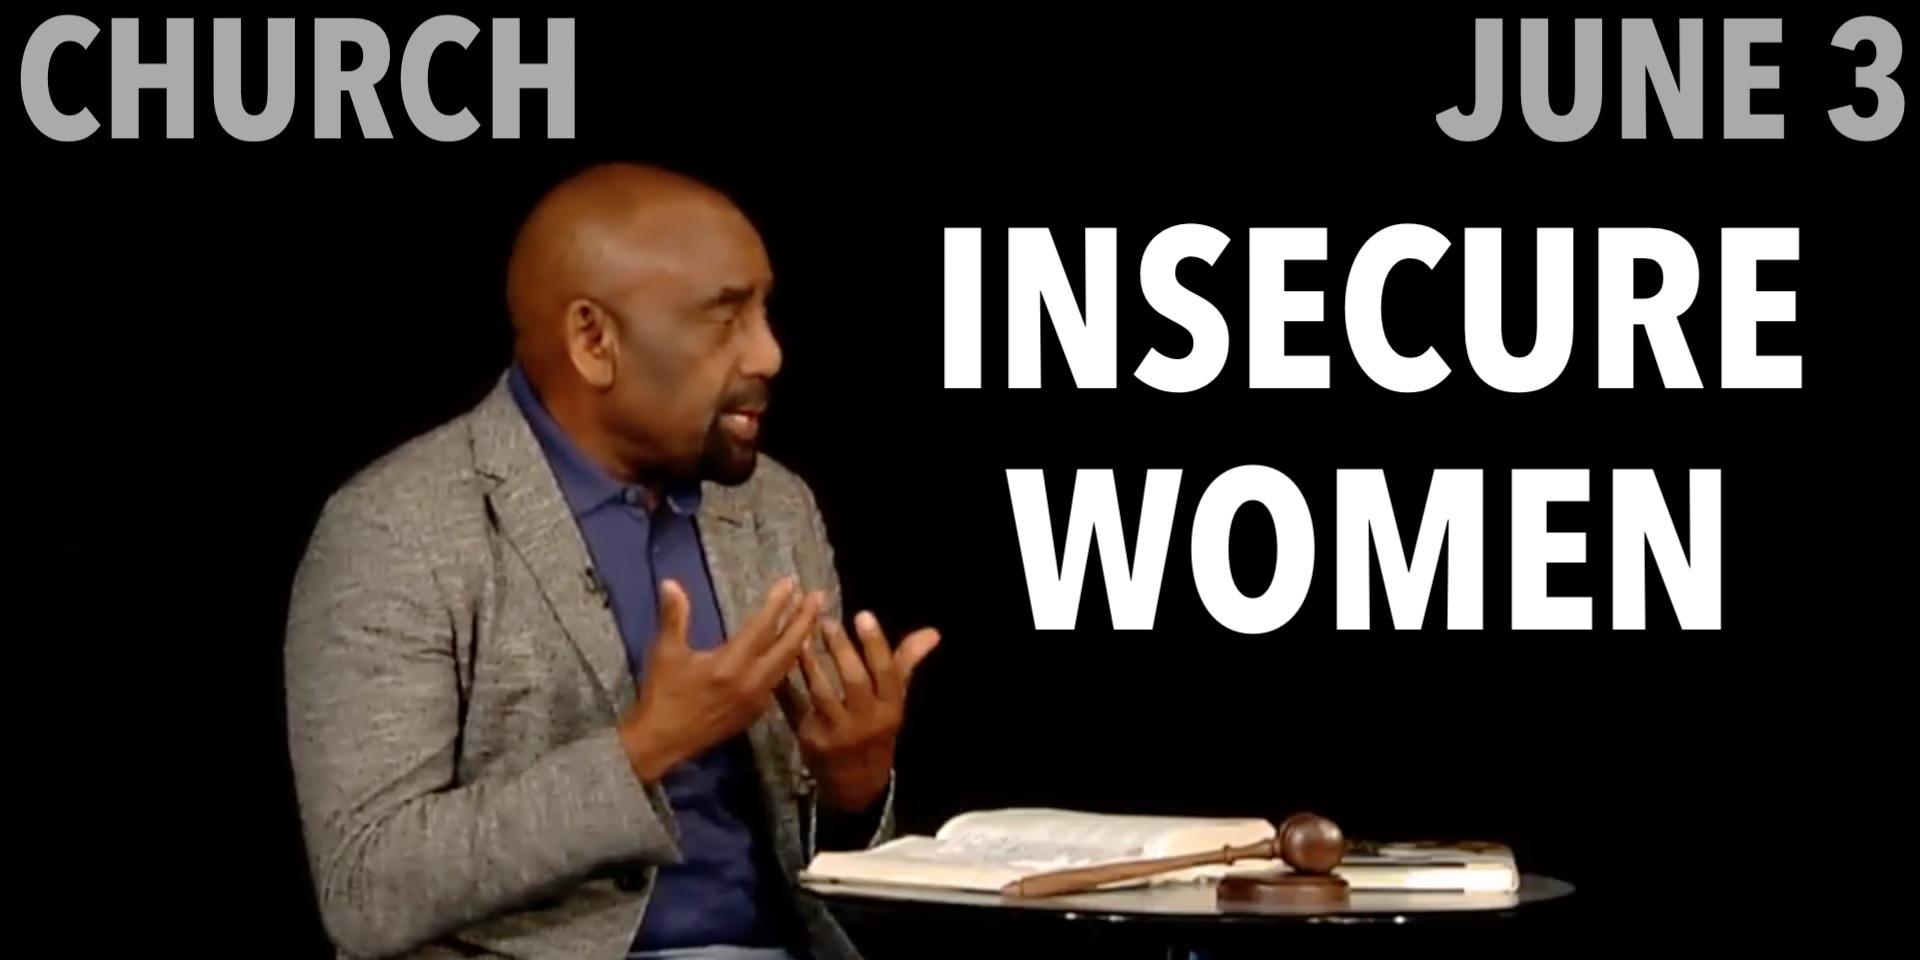 Church June 3: Insecure Women